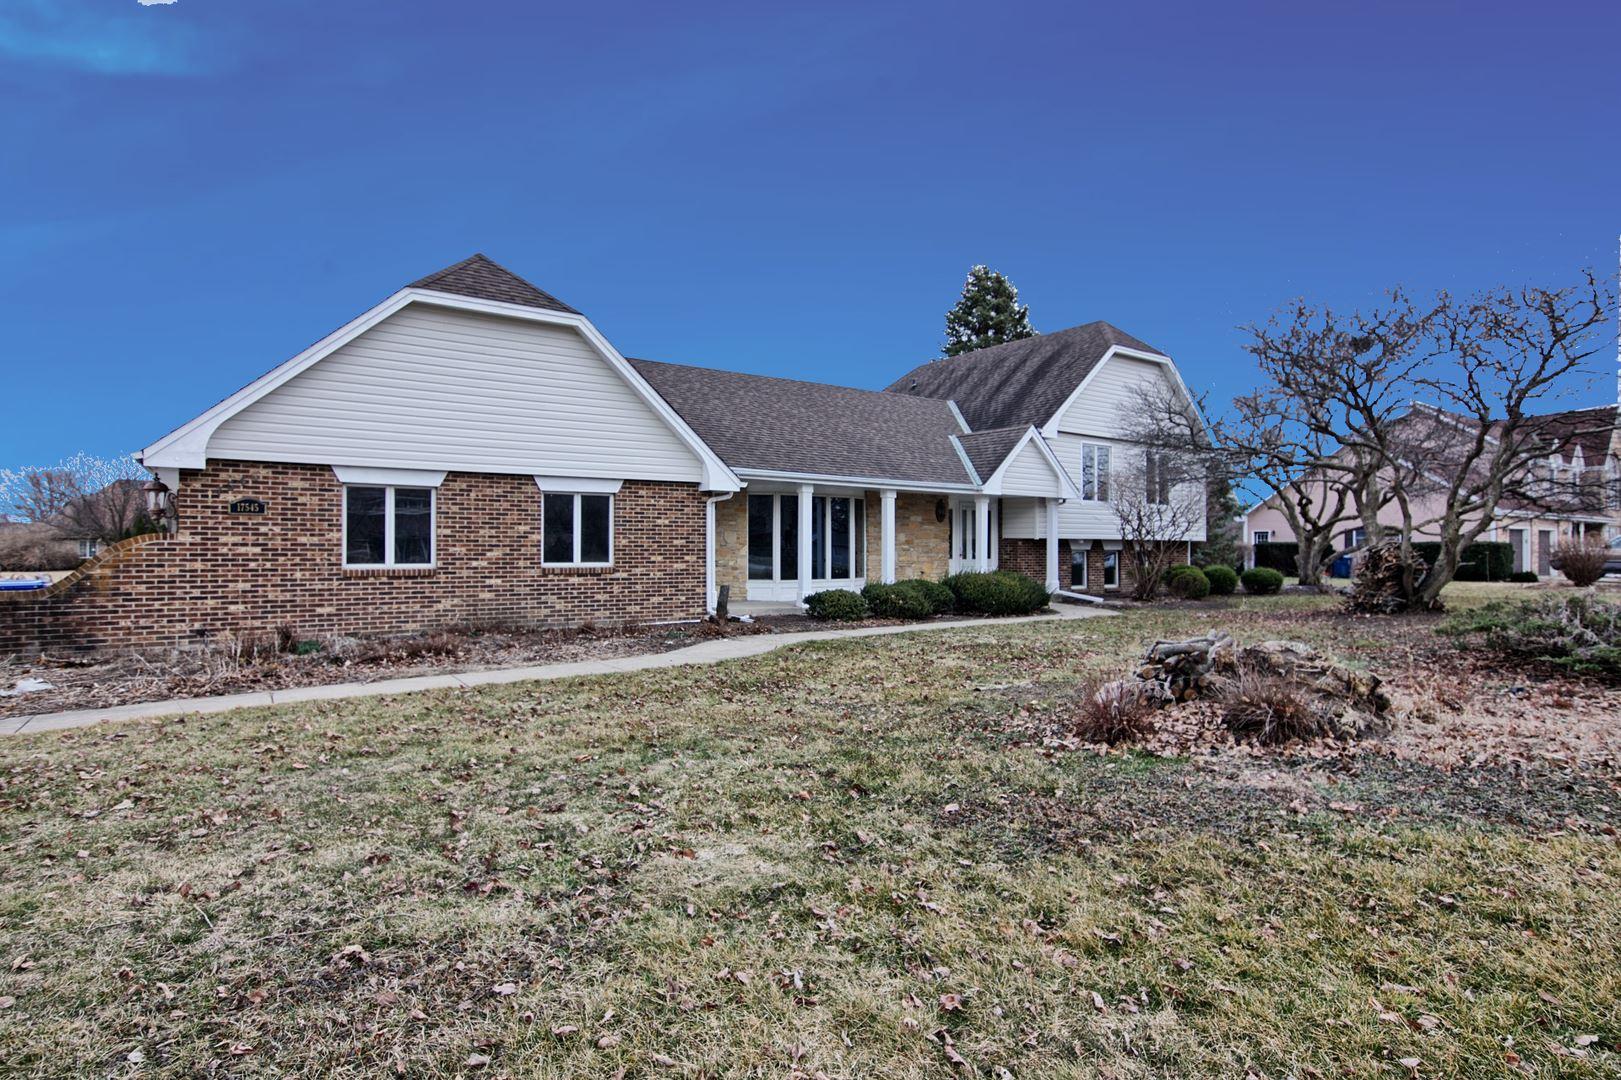 Photo of 17545 S Virginia Drive, Plainfield, IL 60586 (MLS # 11002226)